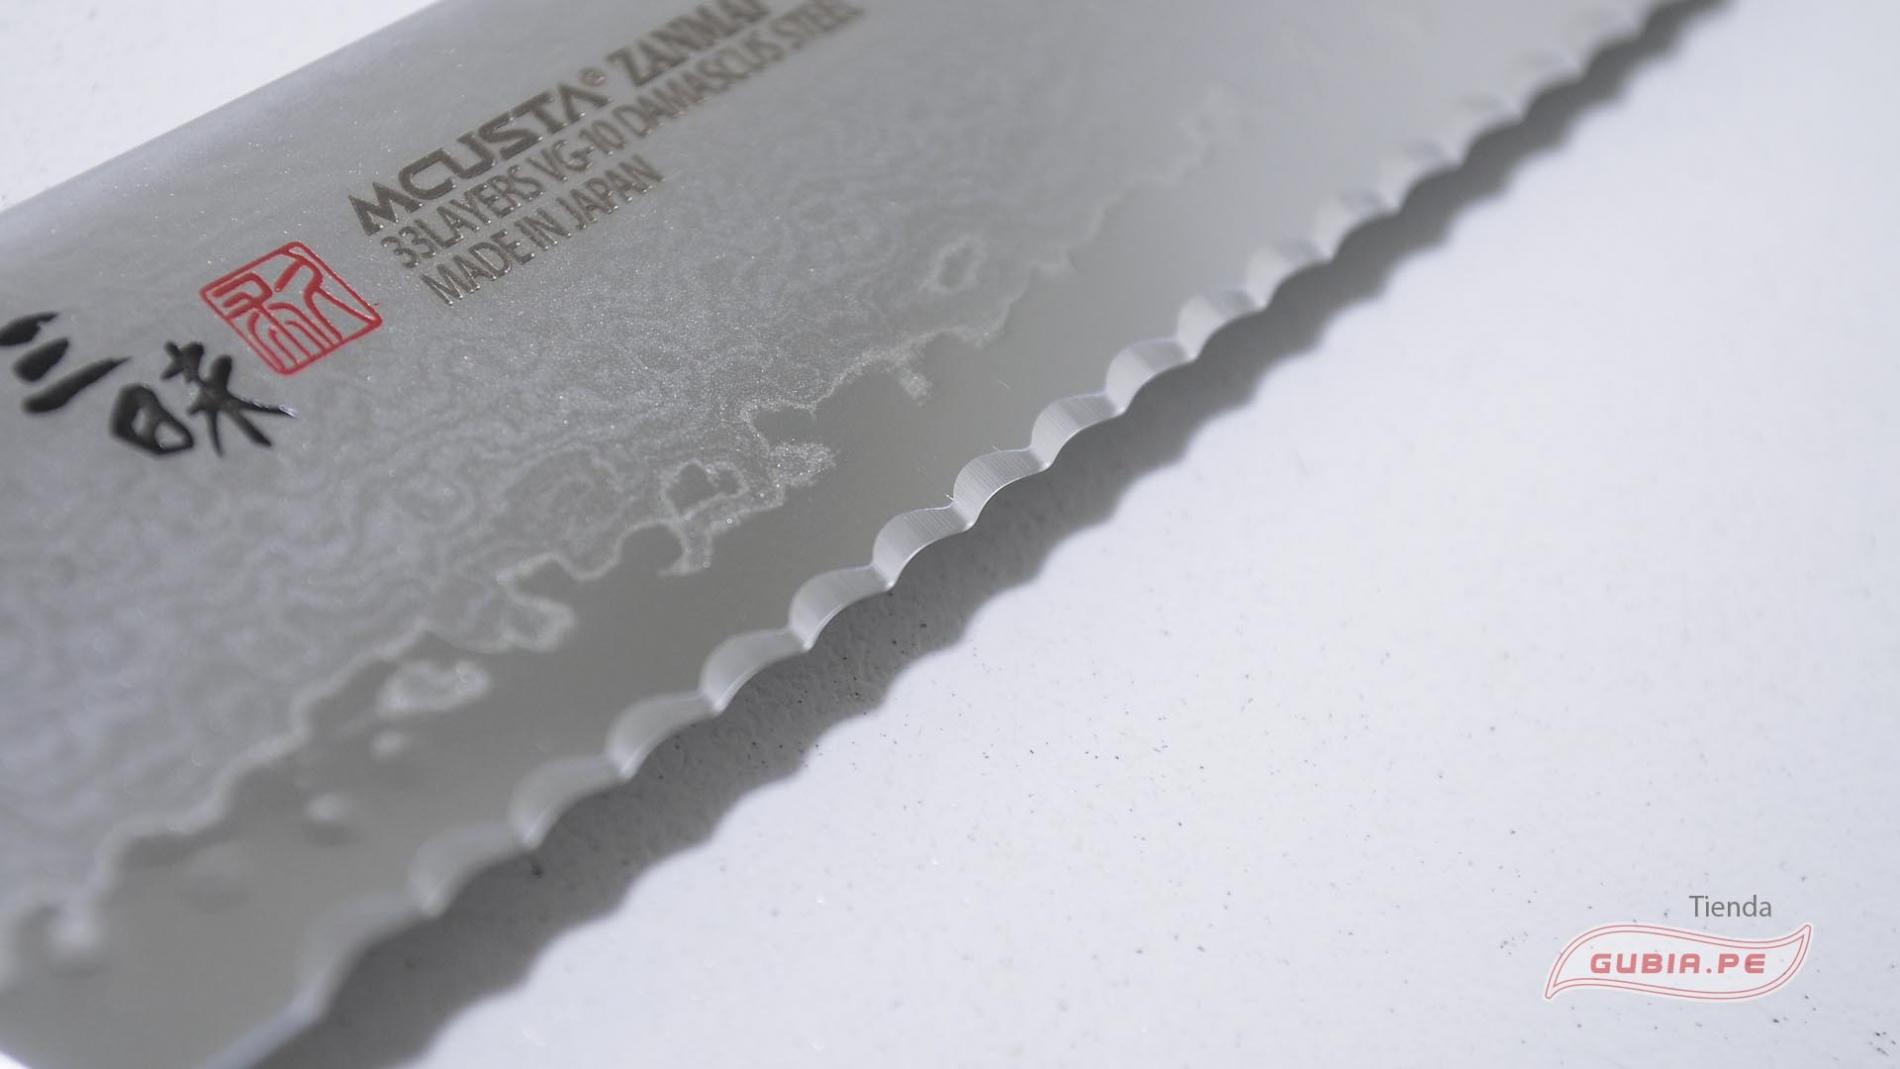 HFR-8014D-Cuchillo Bread Knife 23 cm acero VG10 Classic Pro Damascus Zanmai HFR-8014D-max-1.